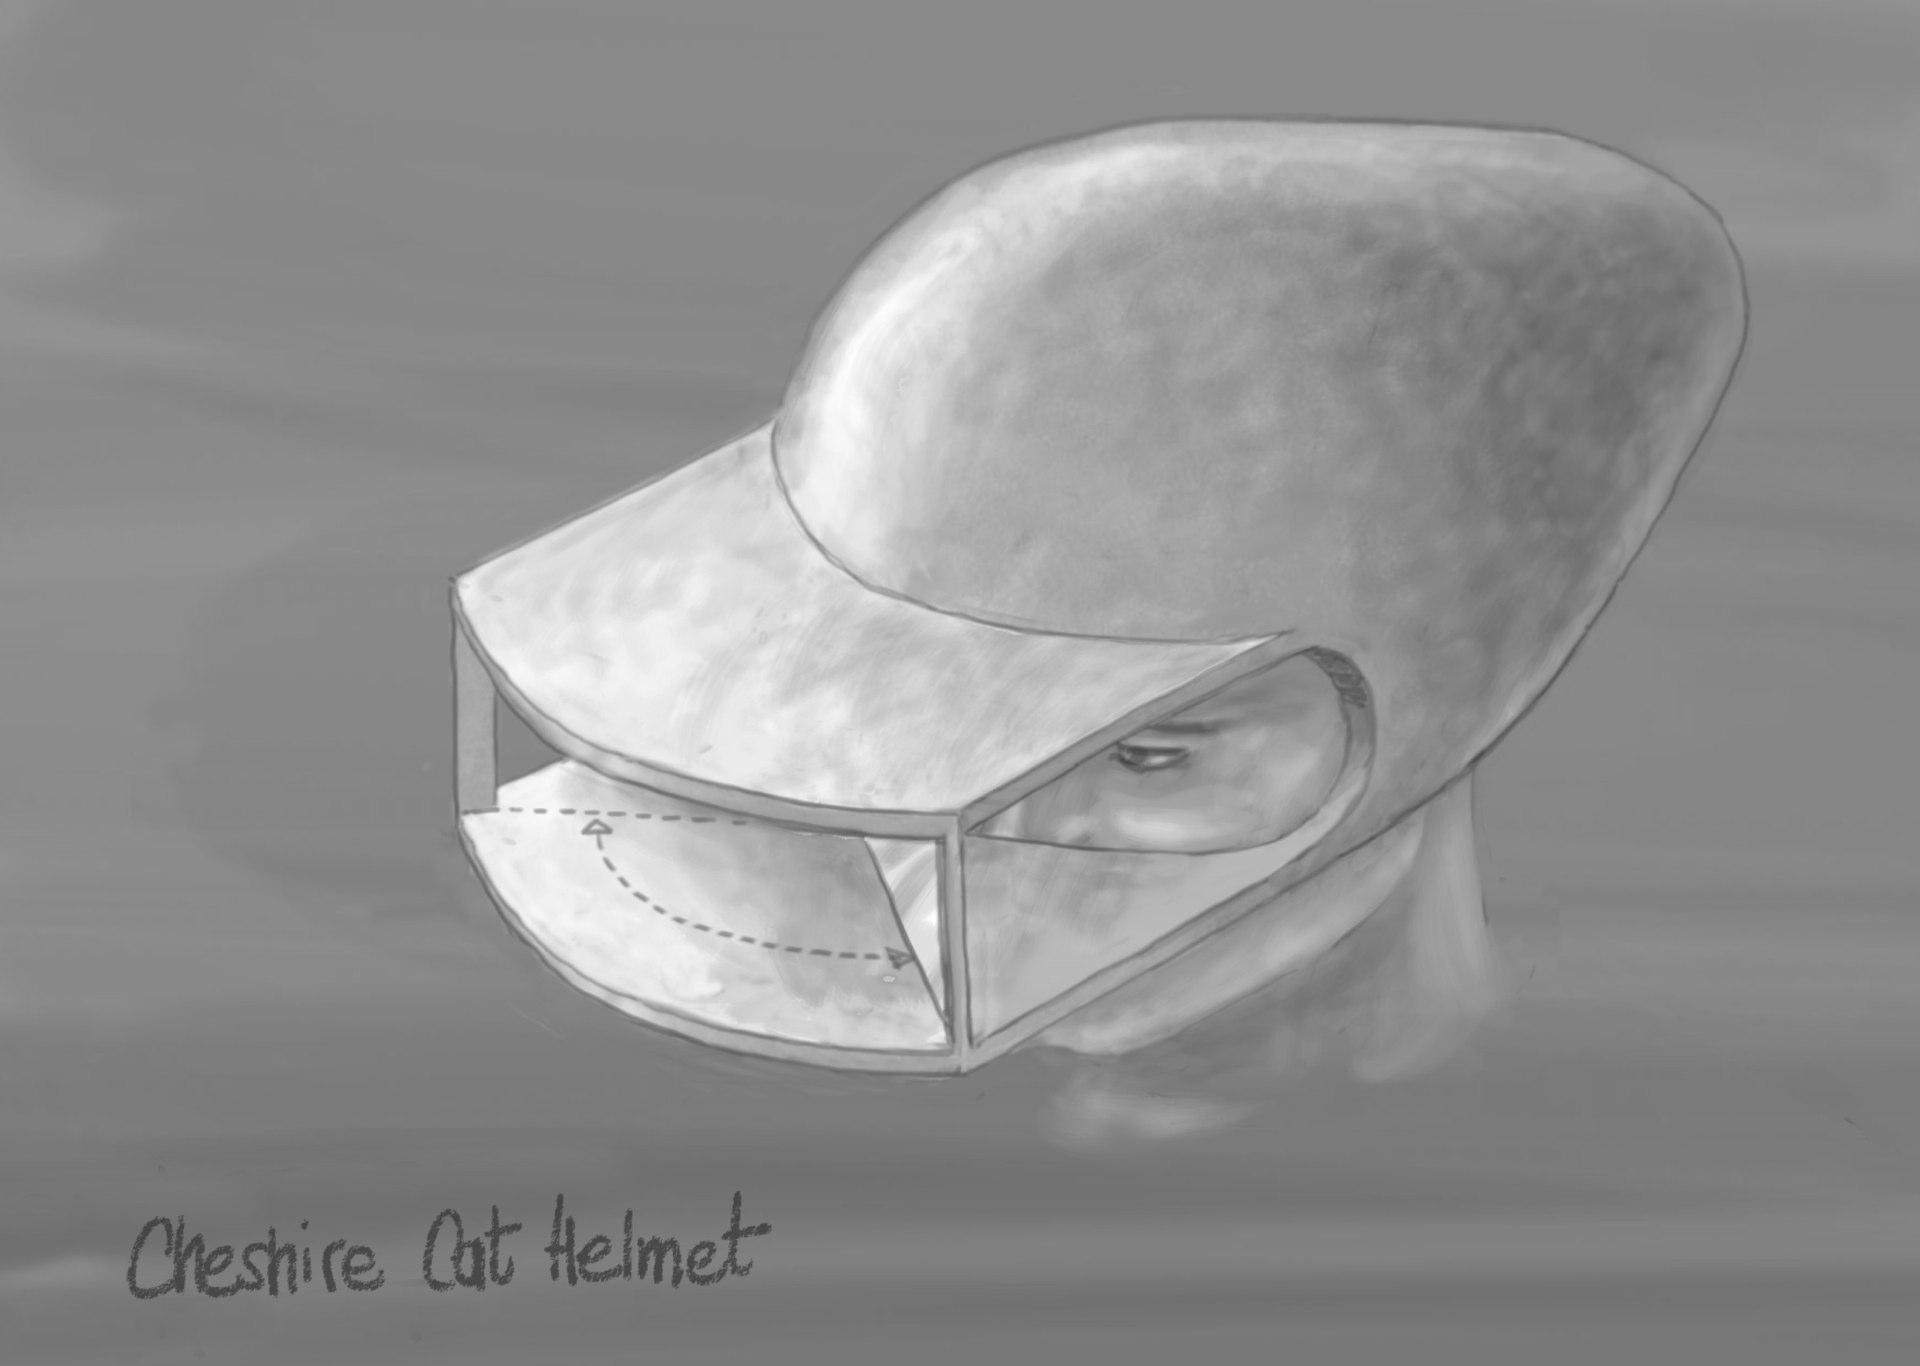 Meta-perceptual-helmets-2014.025.jpg